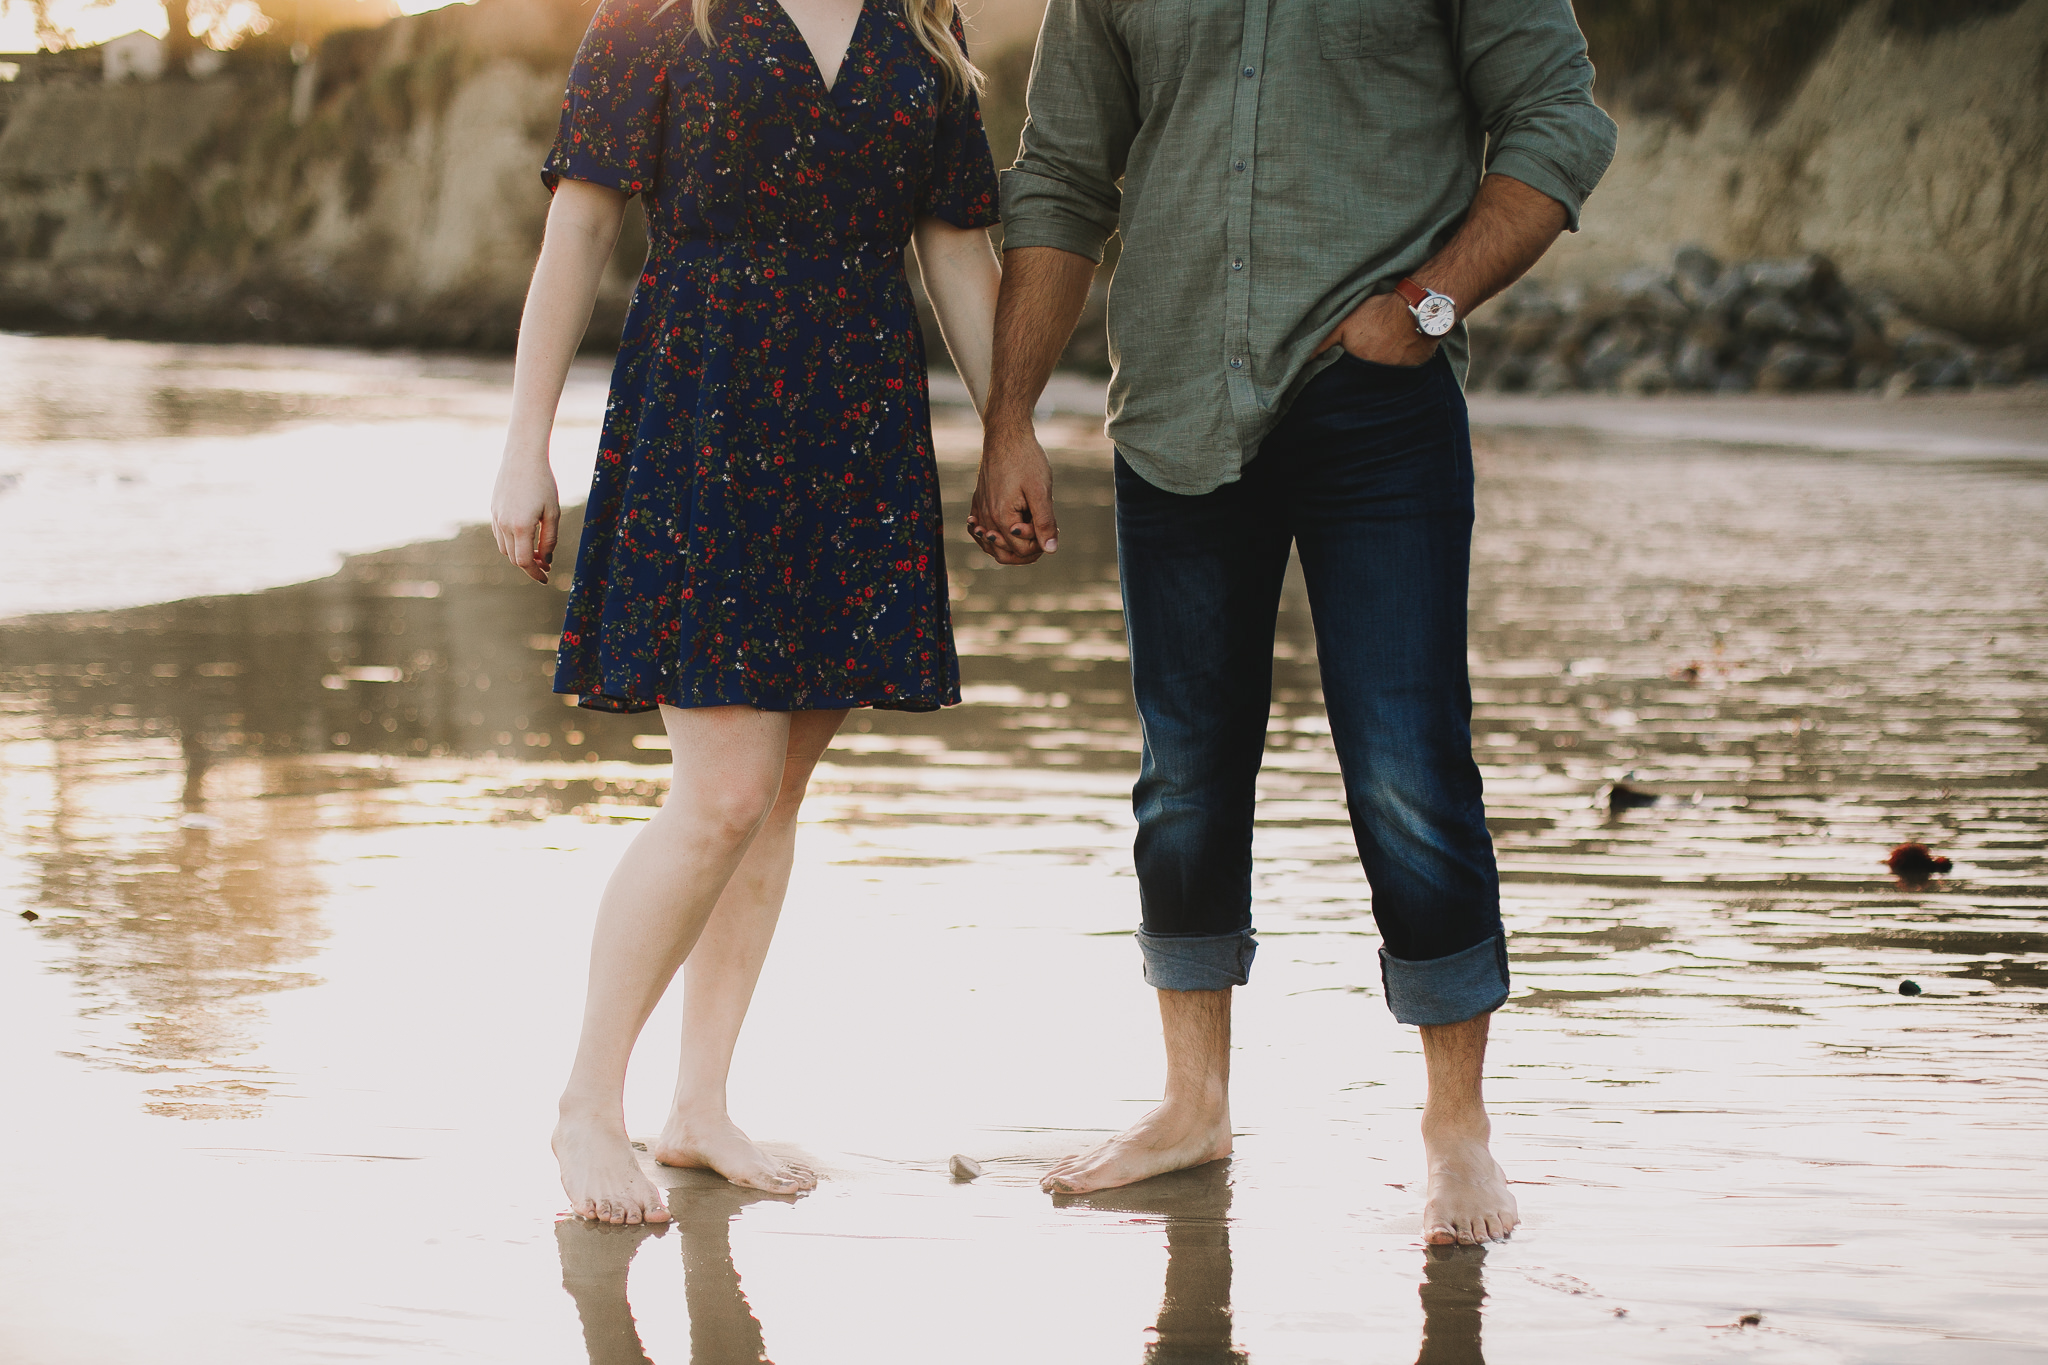 Archer Inspired Photography Capitola Beach Santa Cruz Wedding Engagement Lifestyle Session Photographer-93.jpg